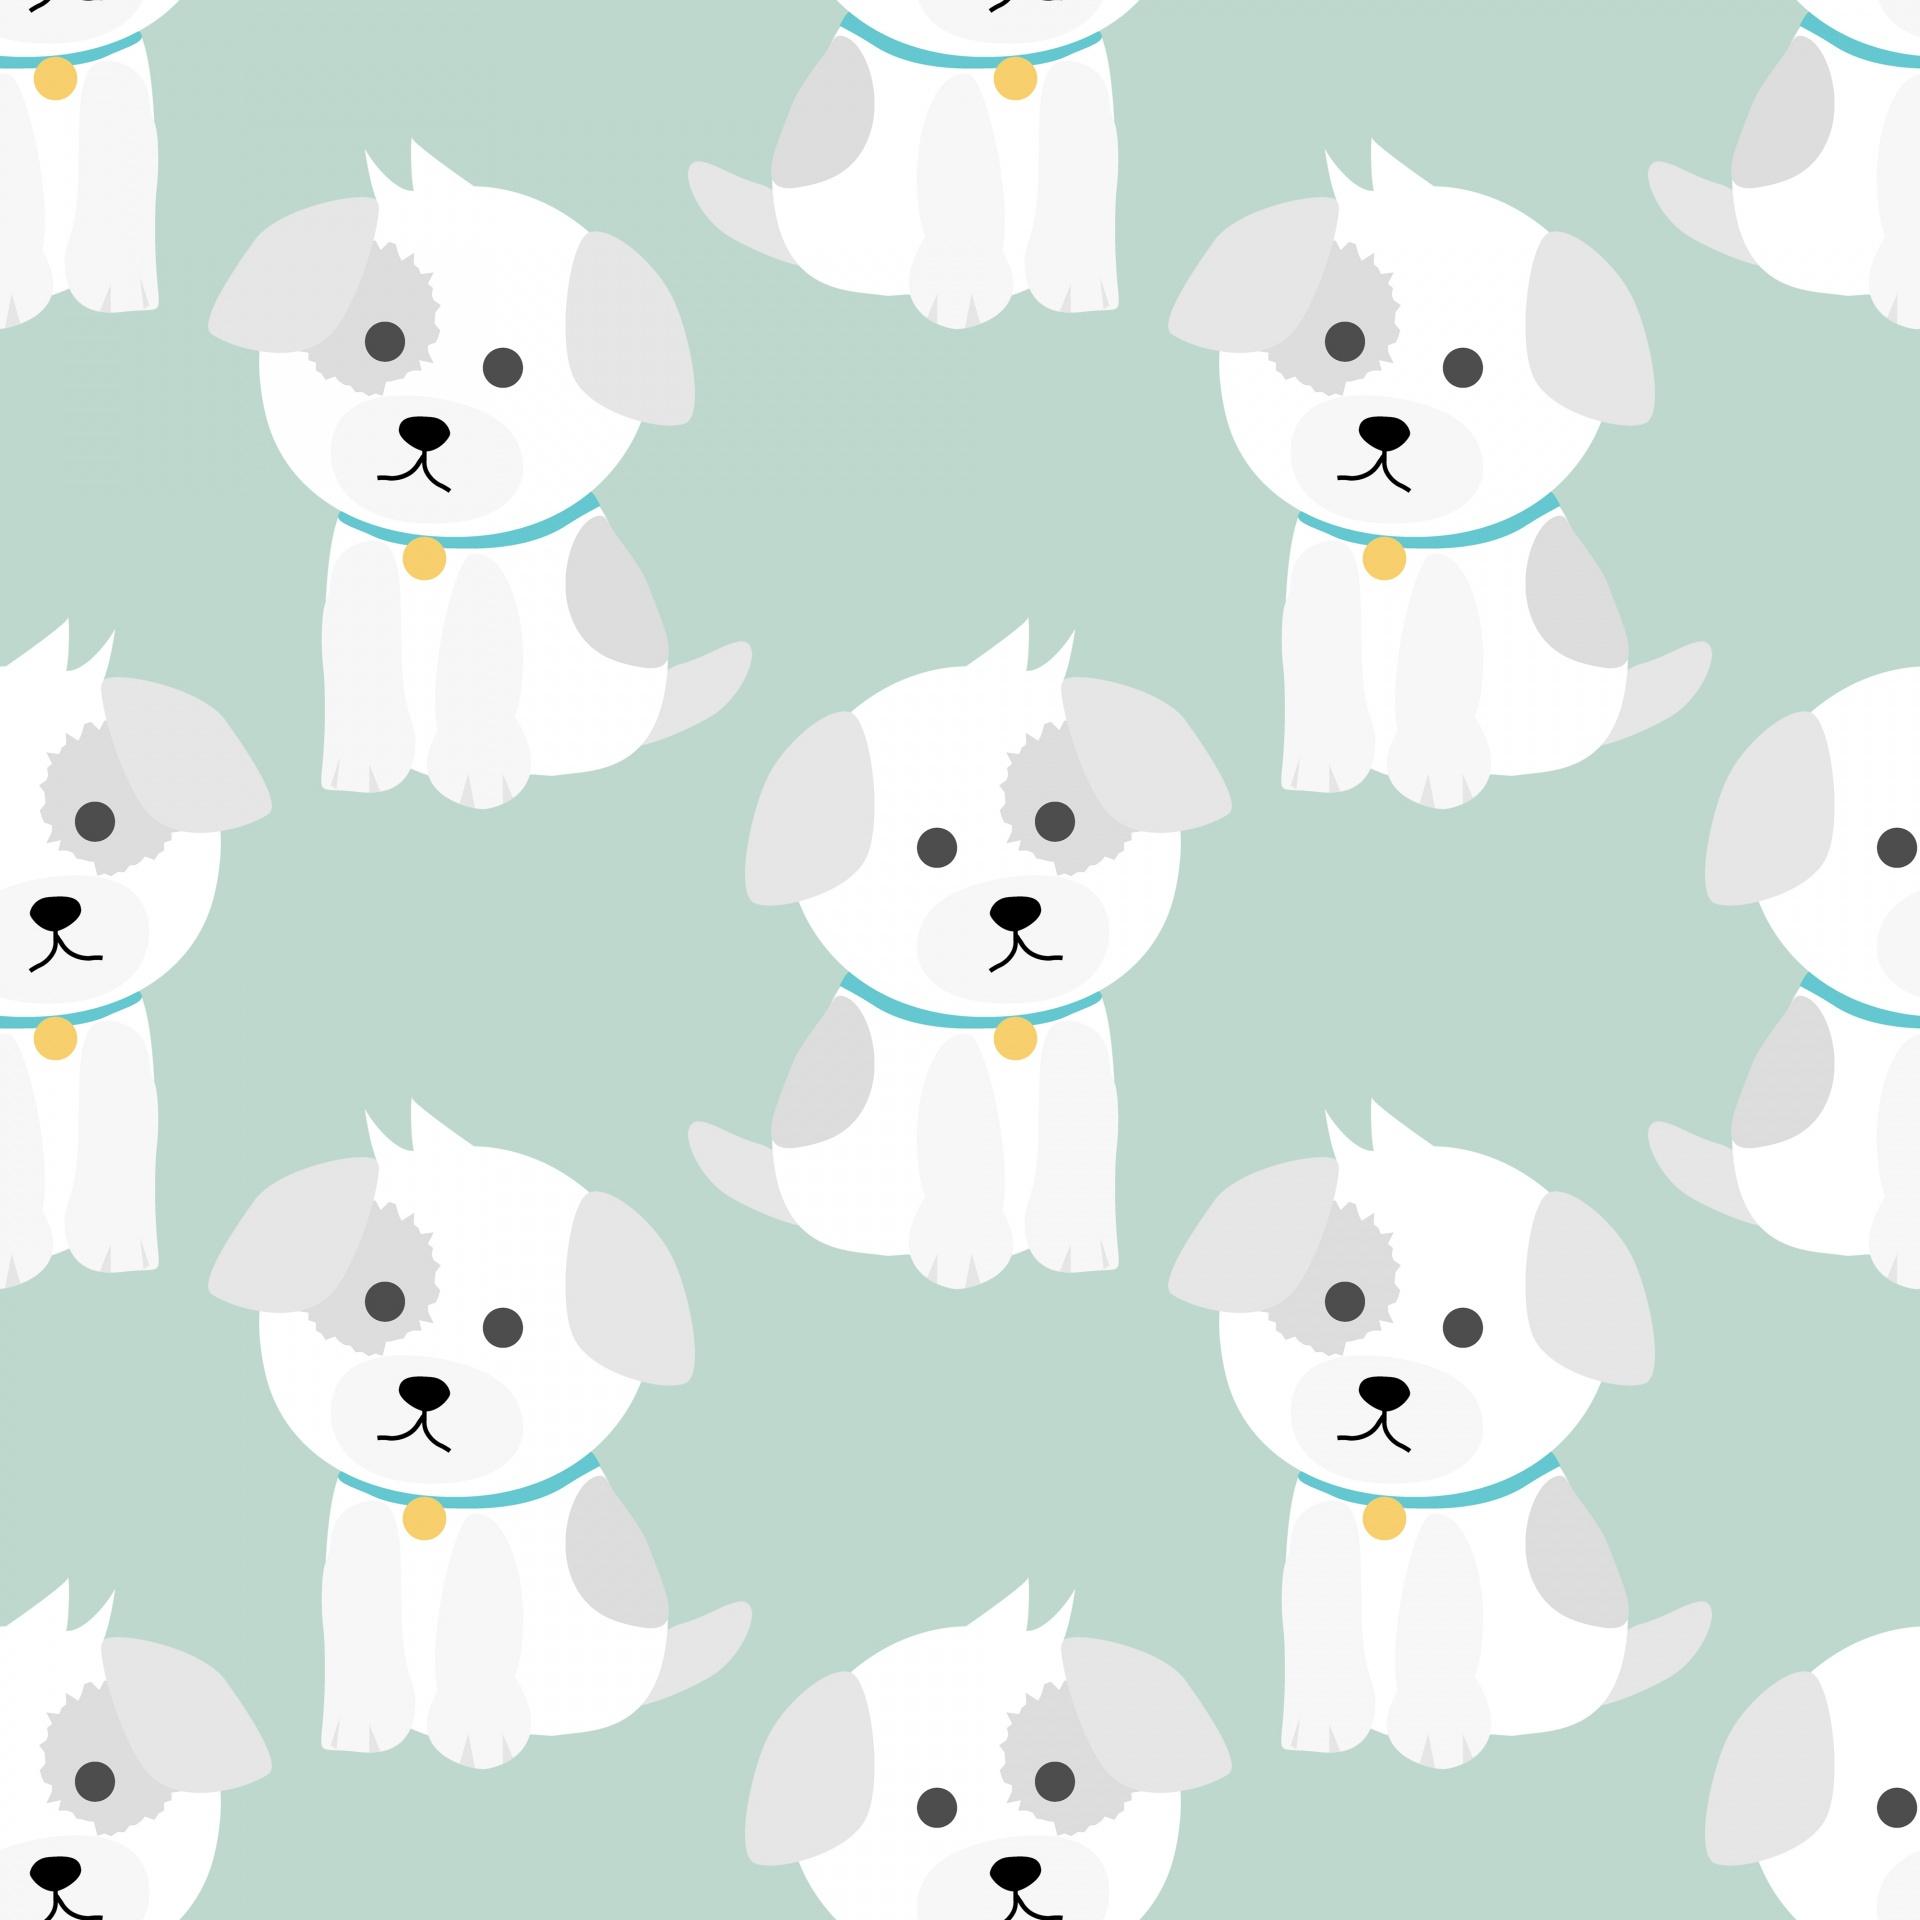 Dog Puppy Cute Art Illustration Free Image From Needpix Com